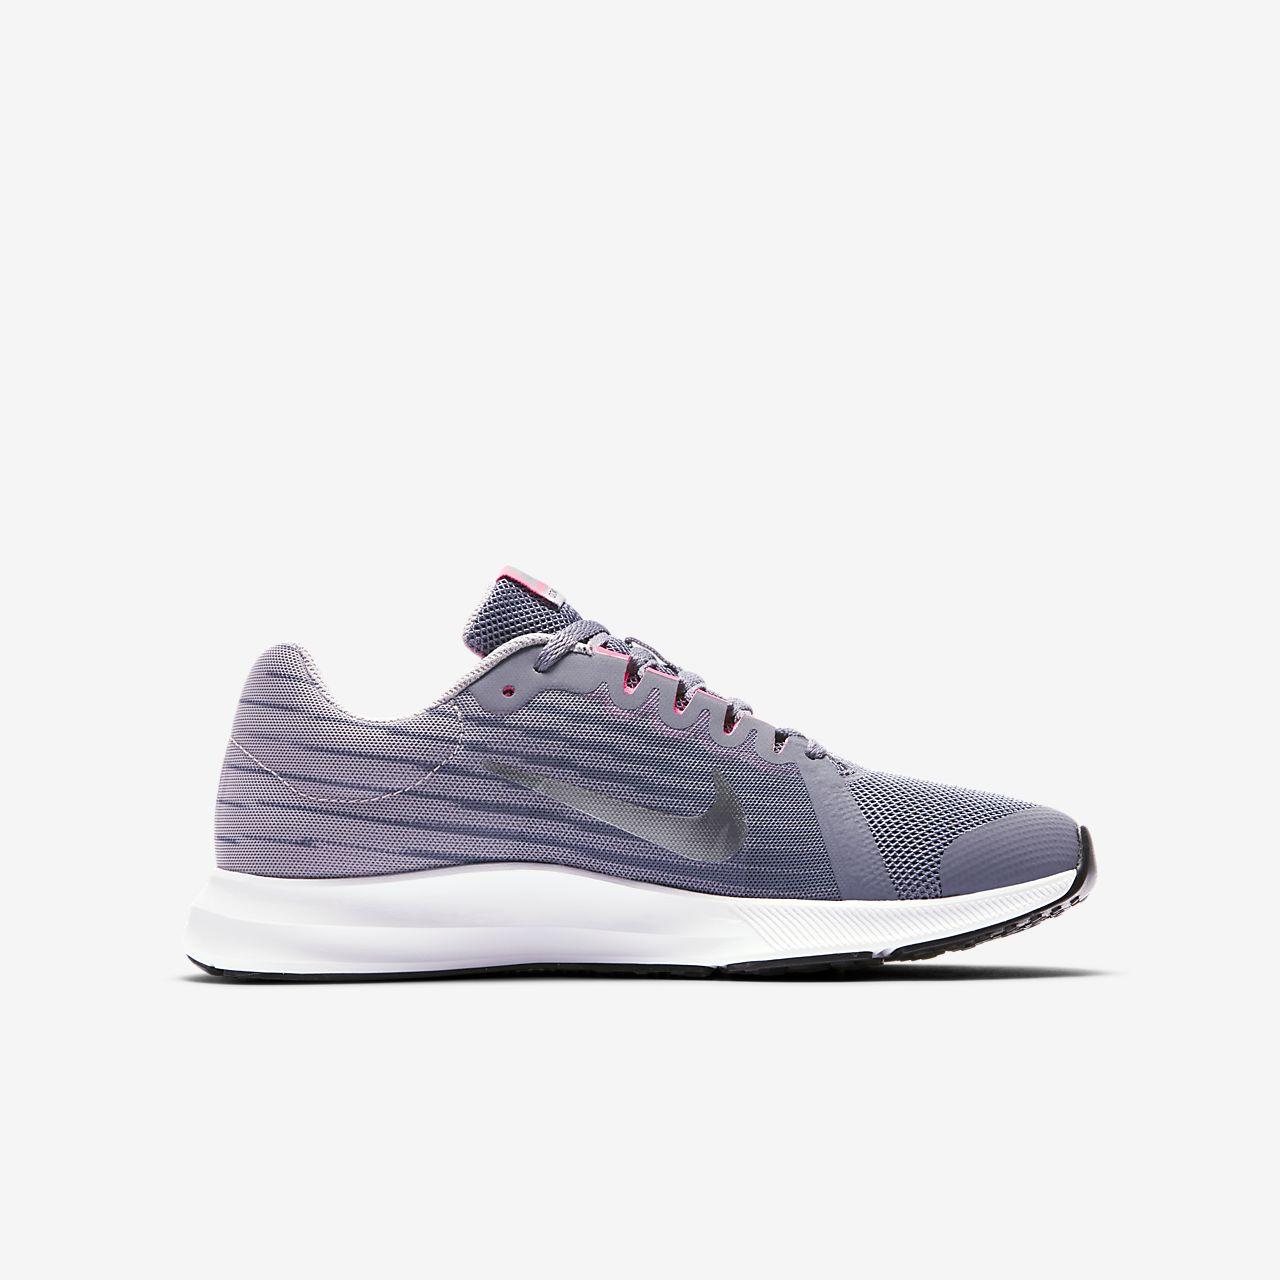 NikeDownshifter 8